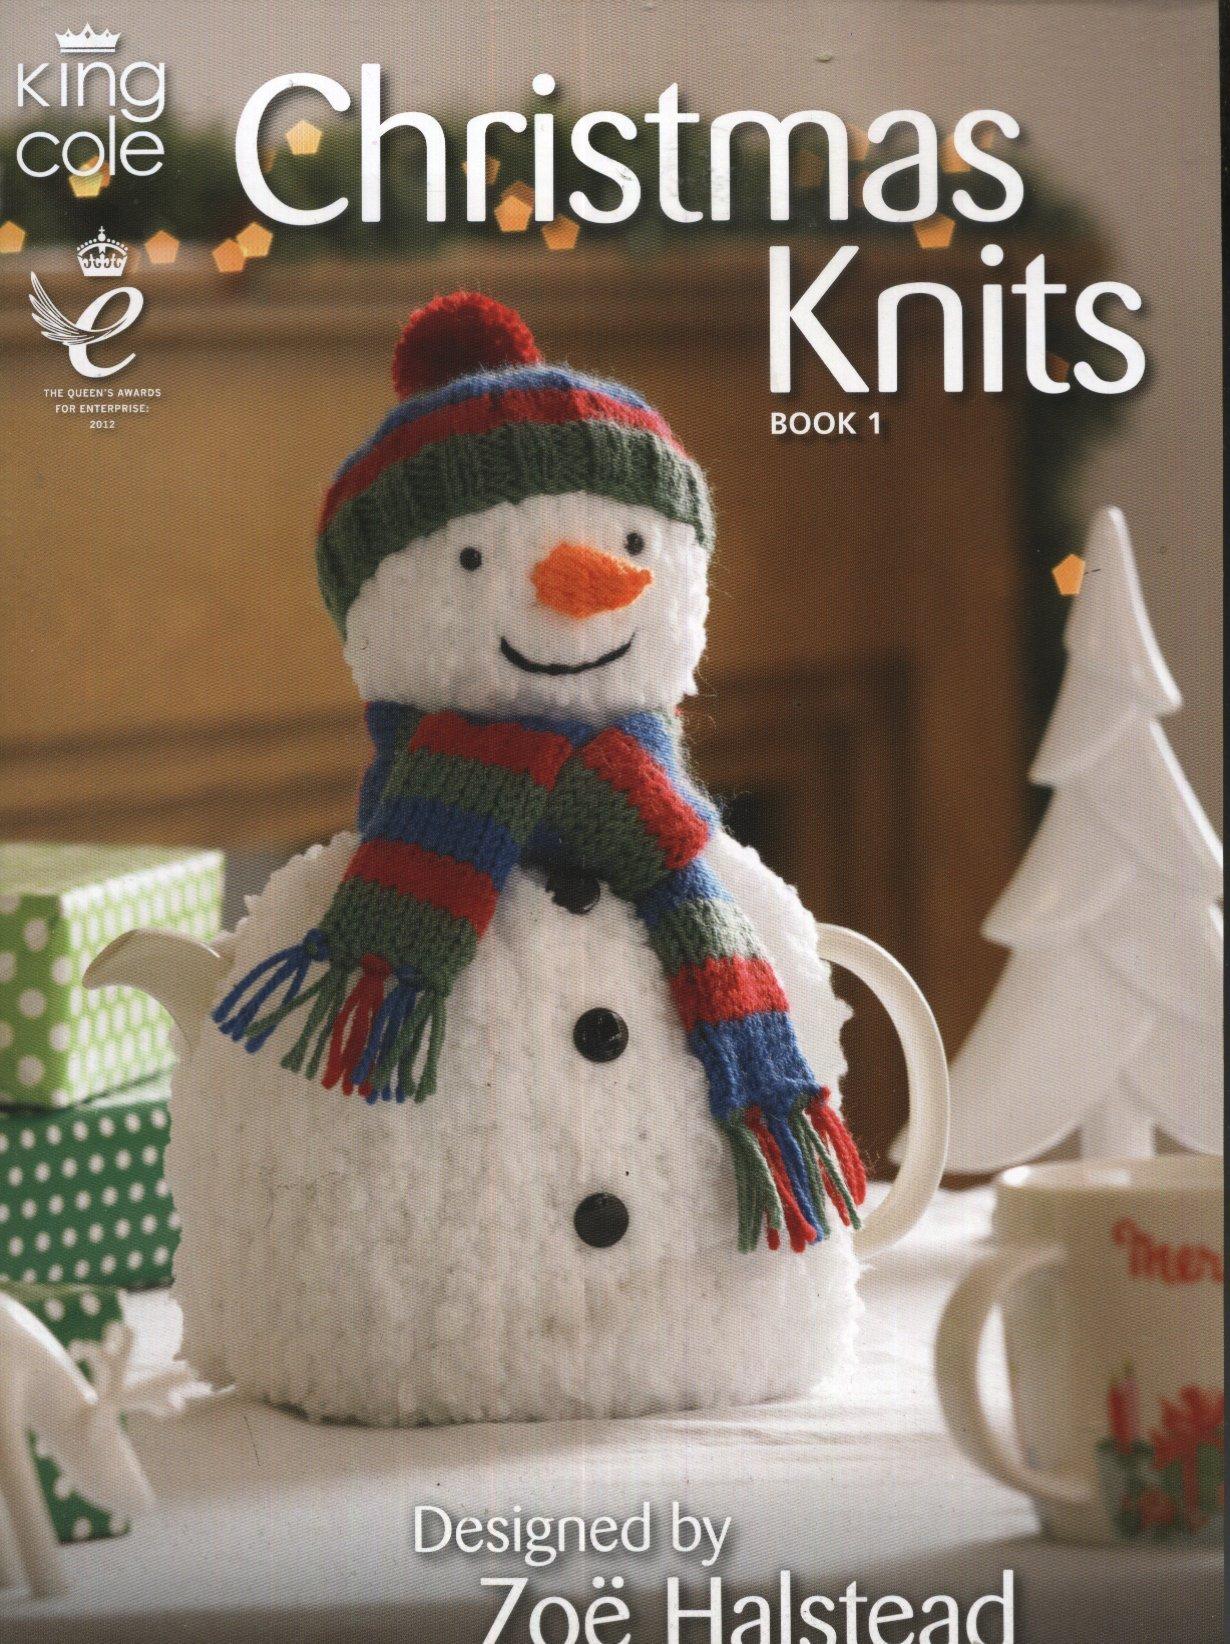 King Cole Knitting Pattern 4111 : DK/Chunky Christmas Novelty ...